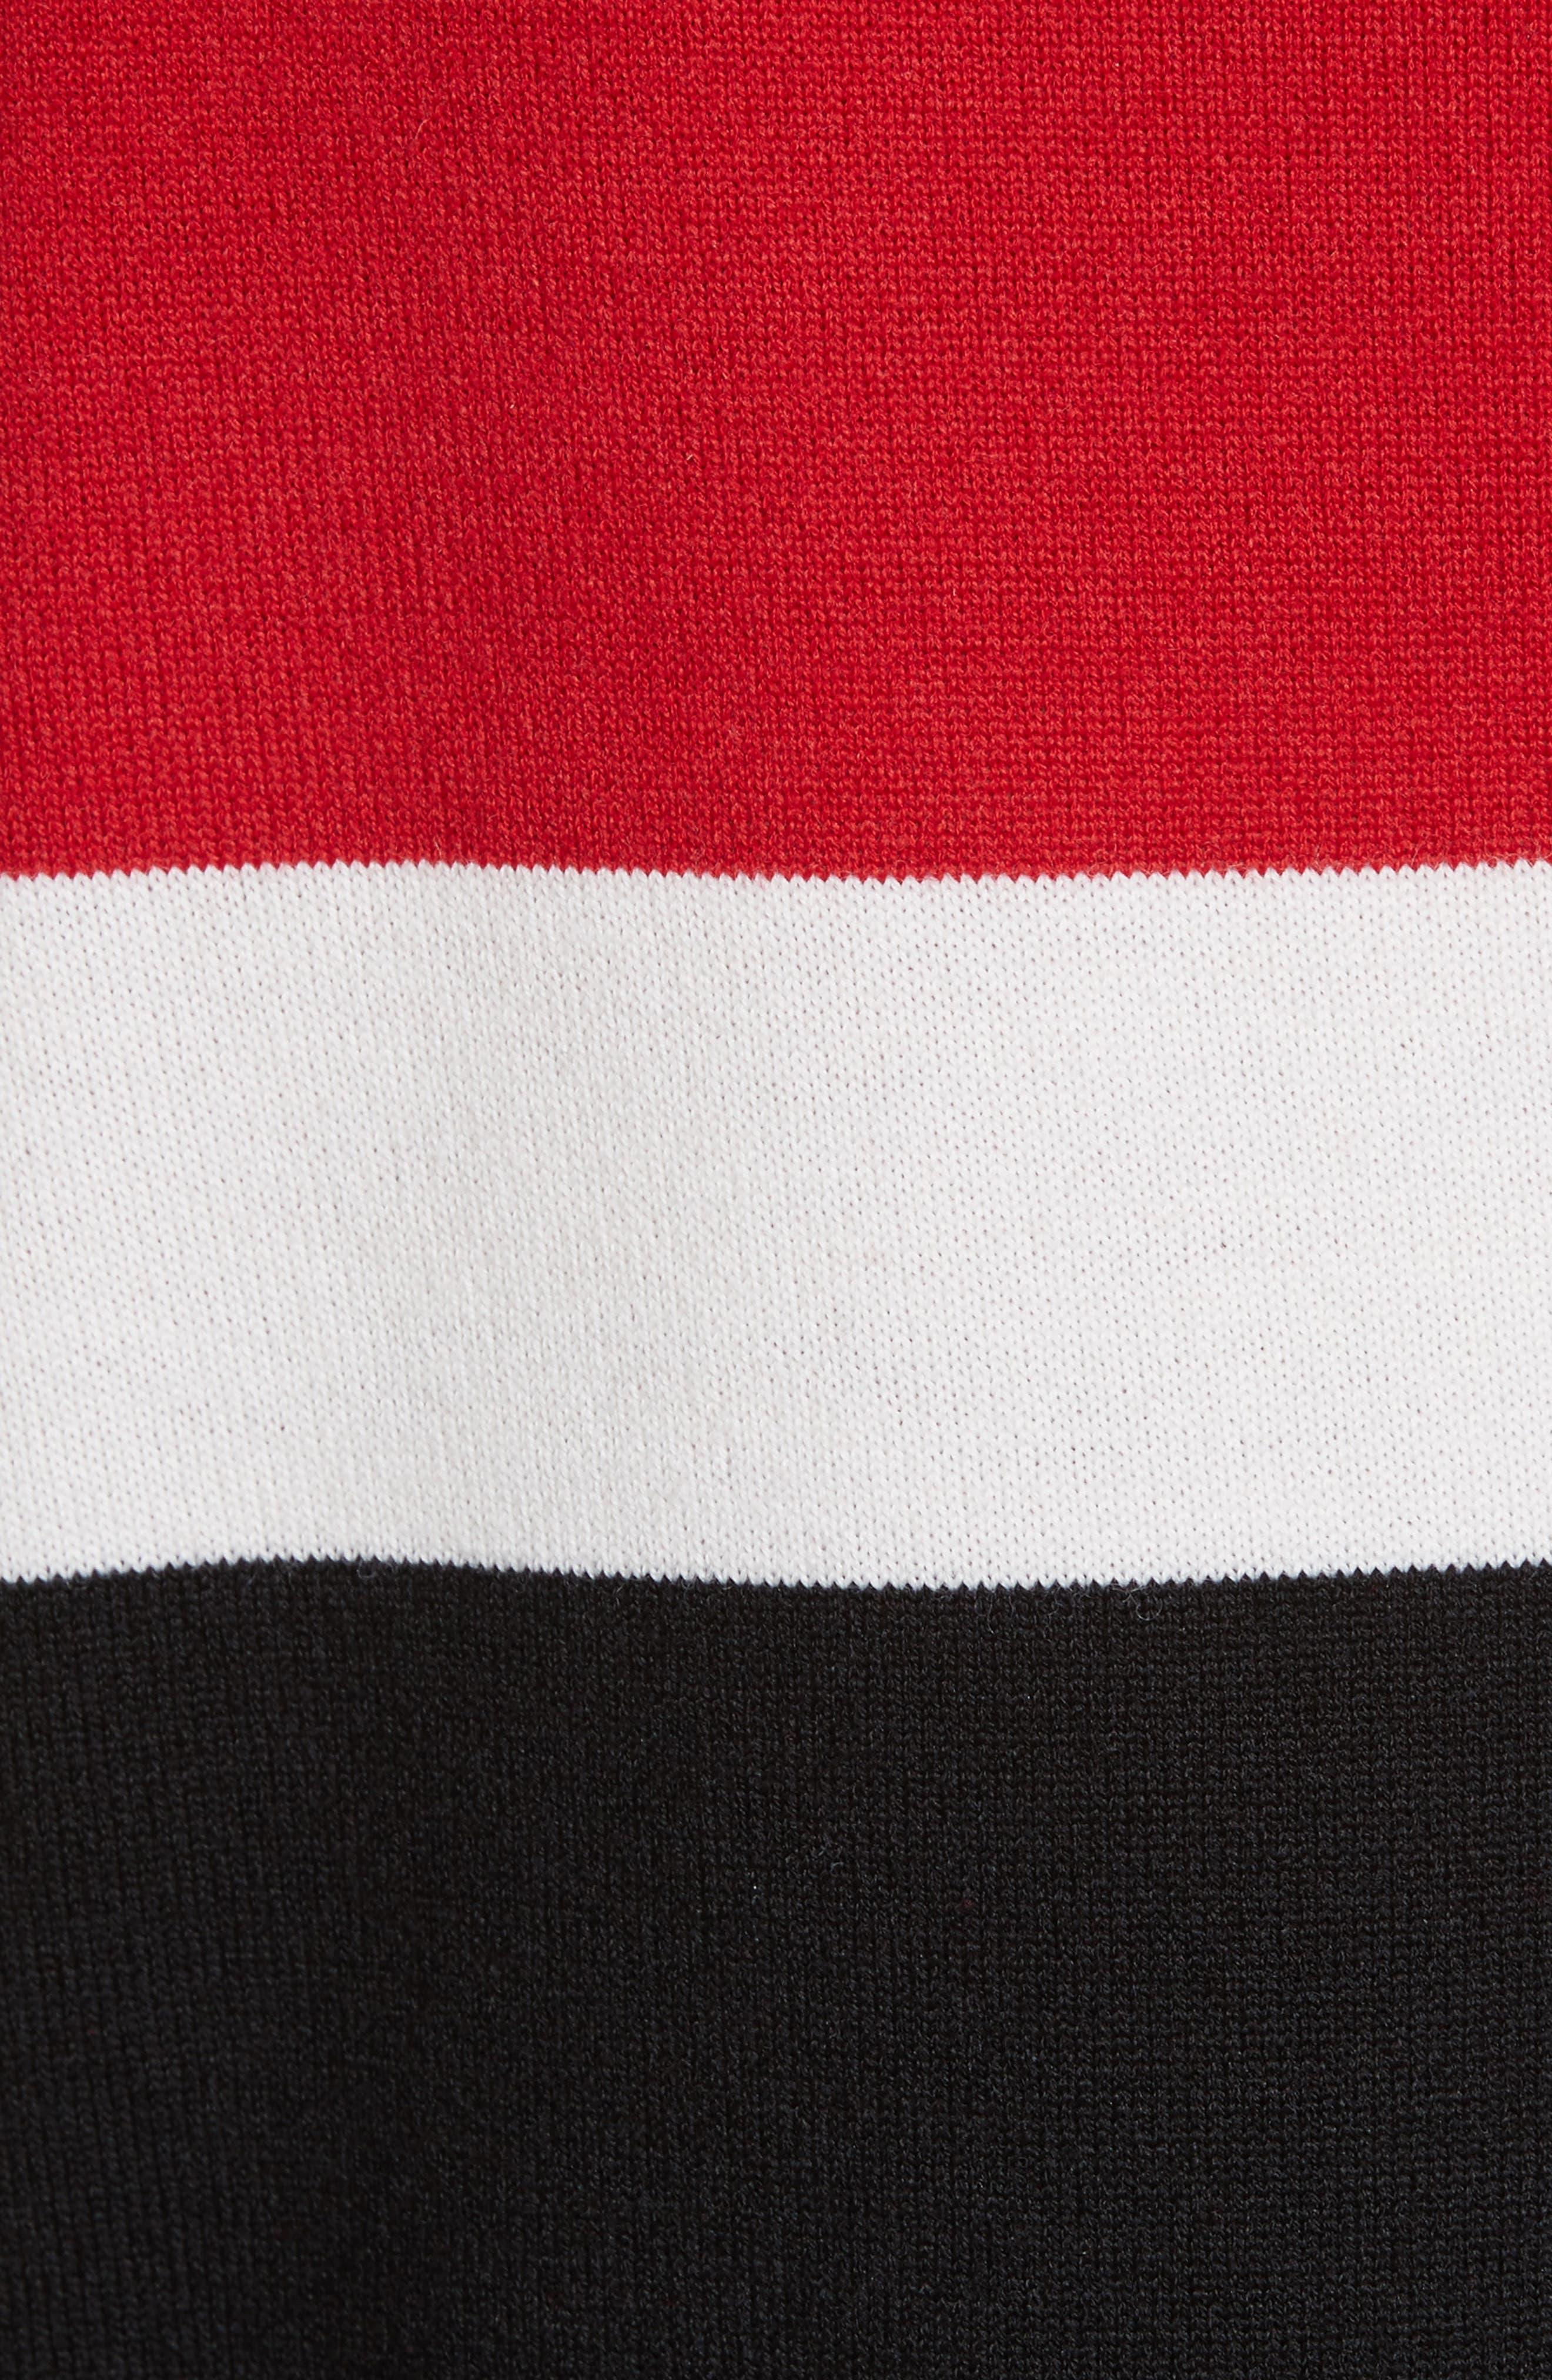 Stripe Wool Blend Pullover,                             Alternate thumbnail 5, color,                             001